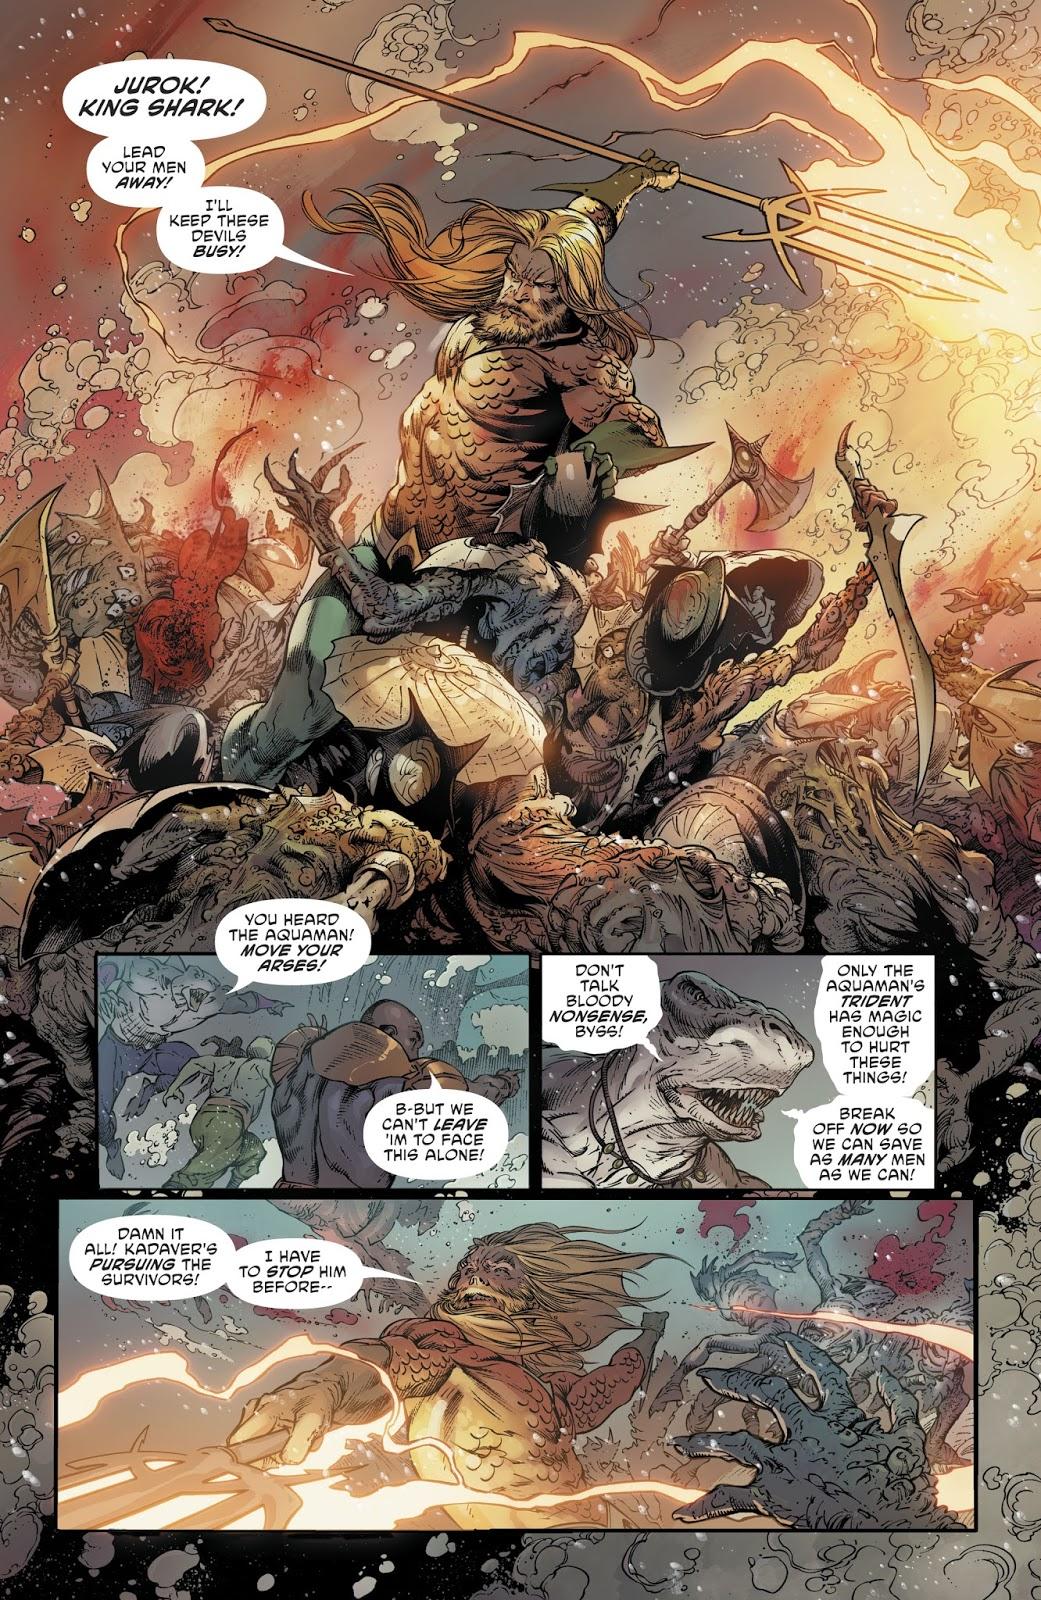 Aquaman 6 Kingslayer review